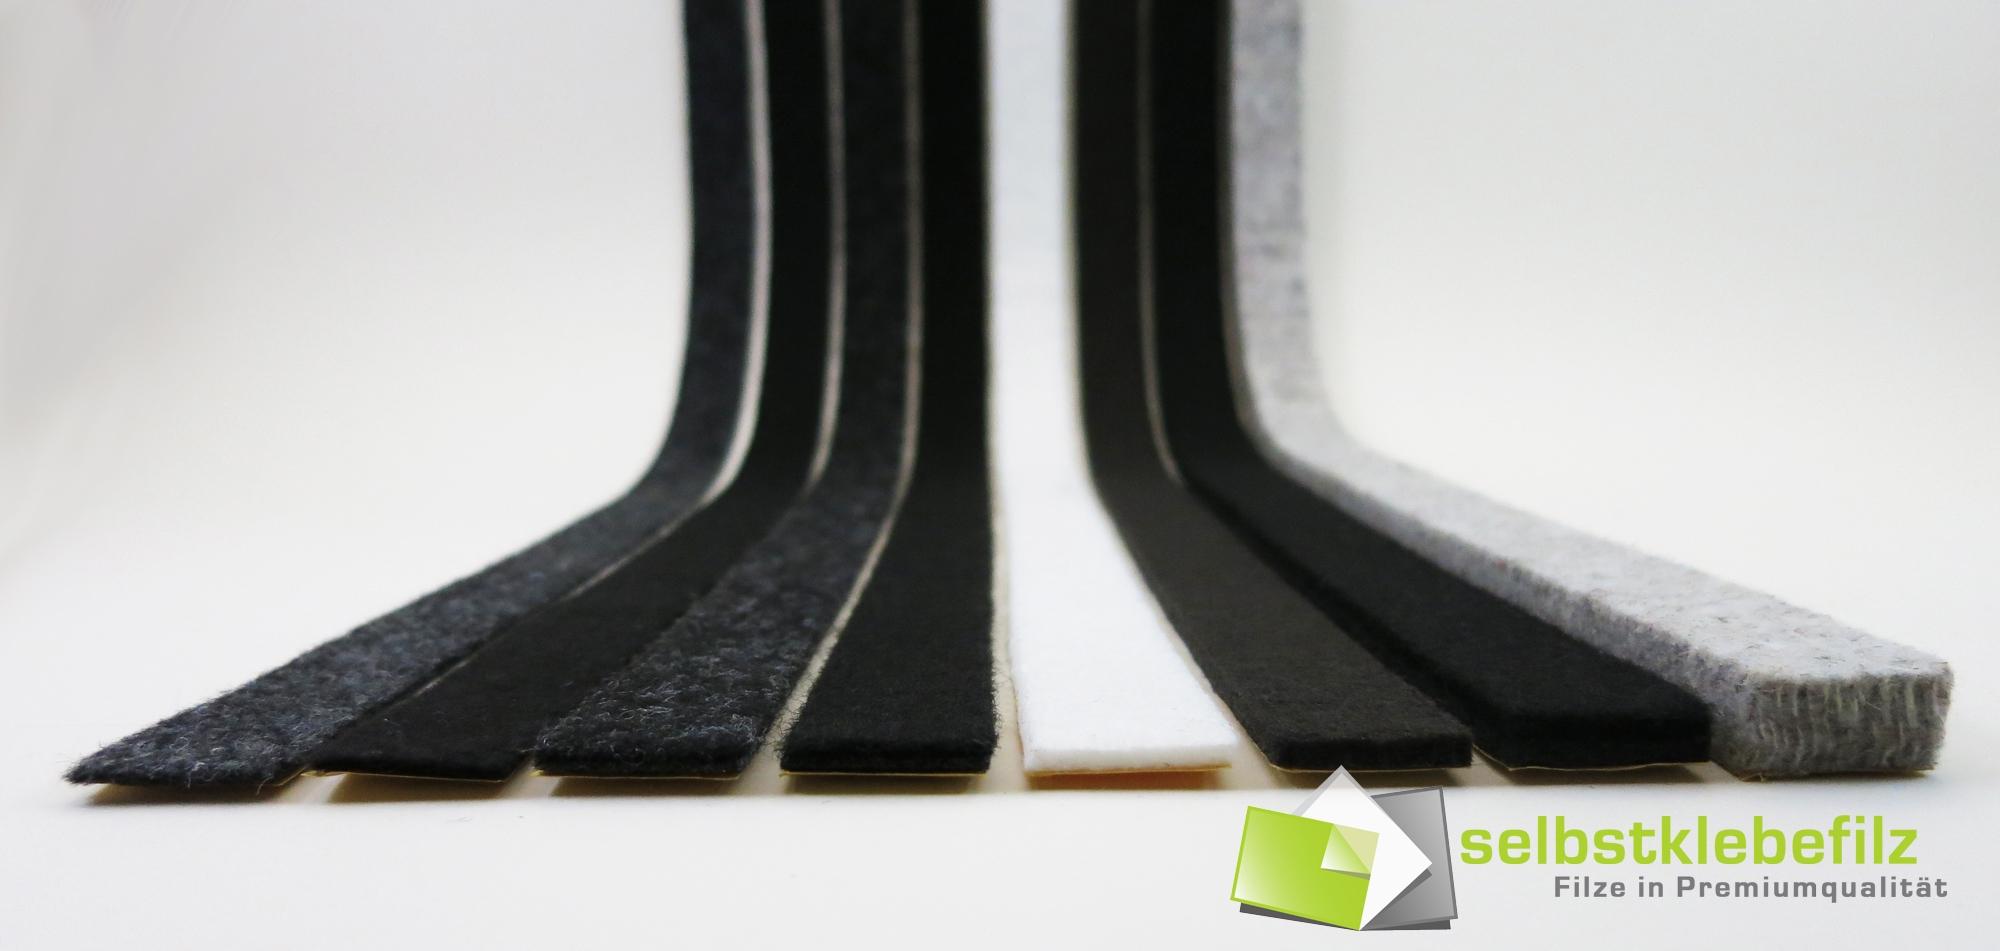 2m Filzklebeband einseitig selbstkl 3mm dick 90mm breit